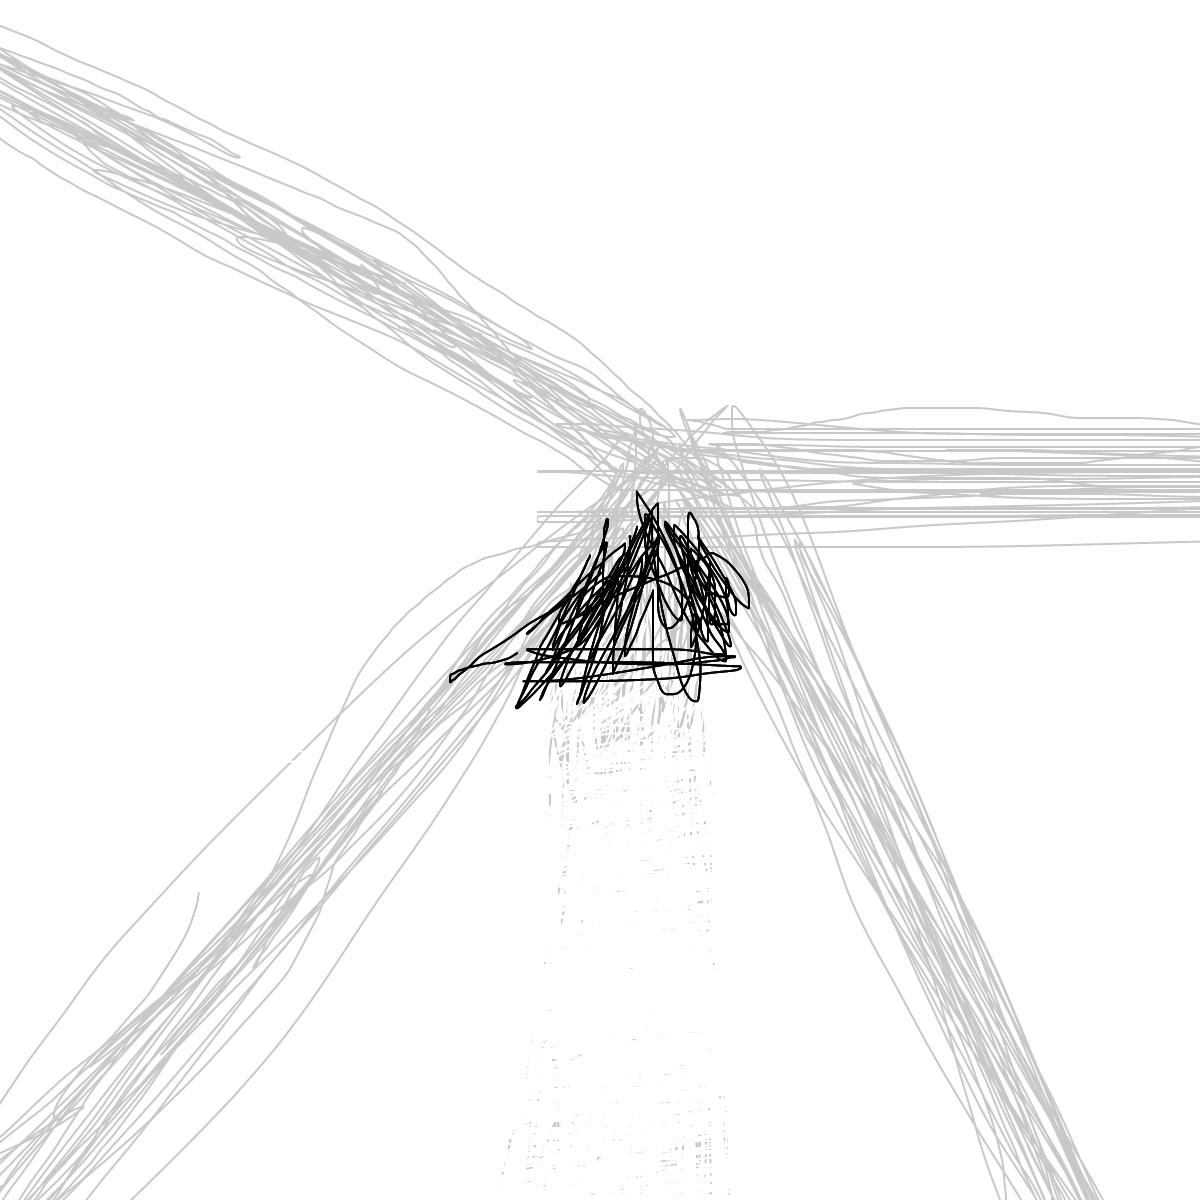 BAAAM drawing#11567 lat:52.4751243591308600lng: 13.4078998565673830